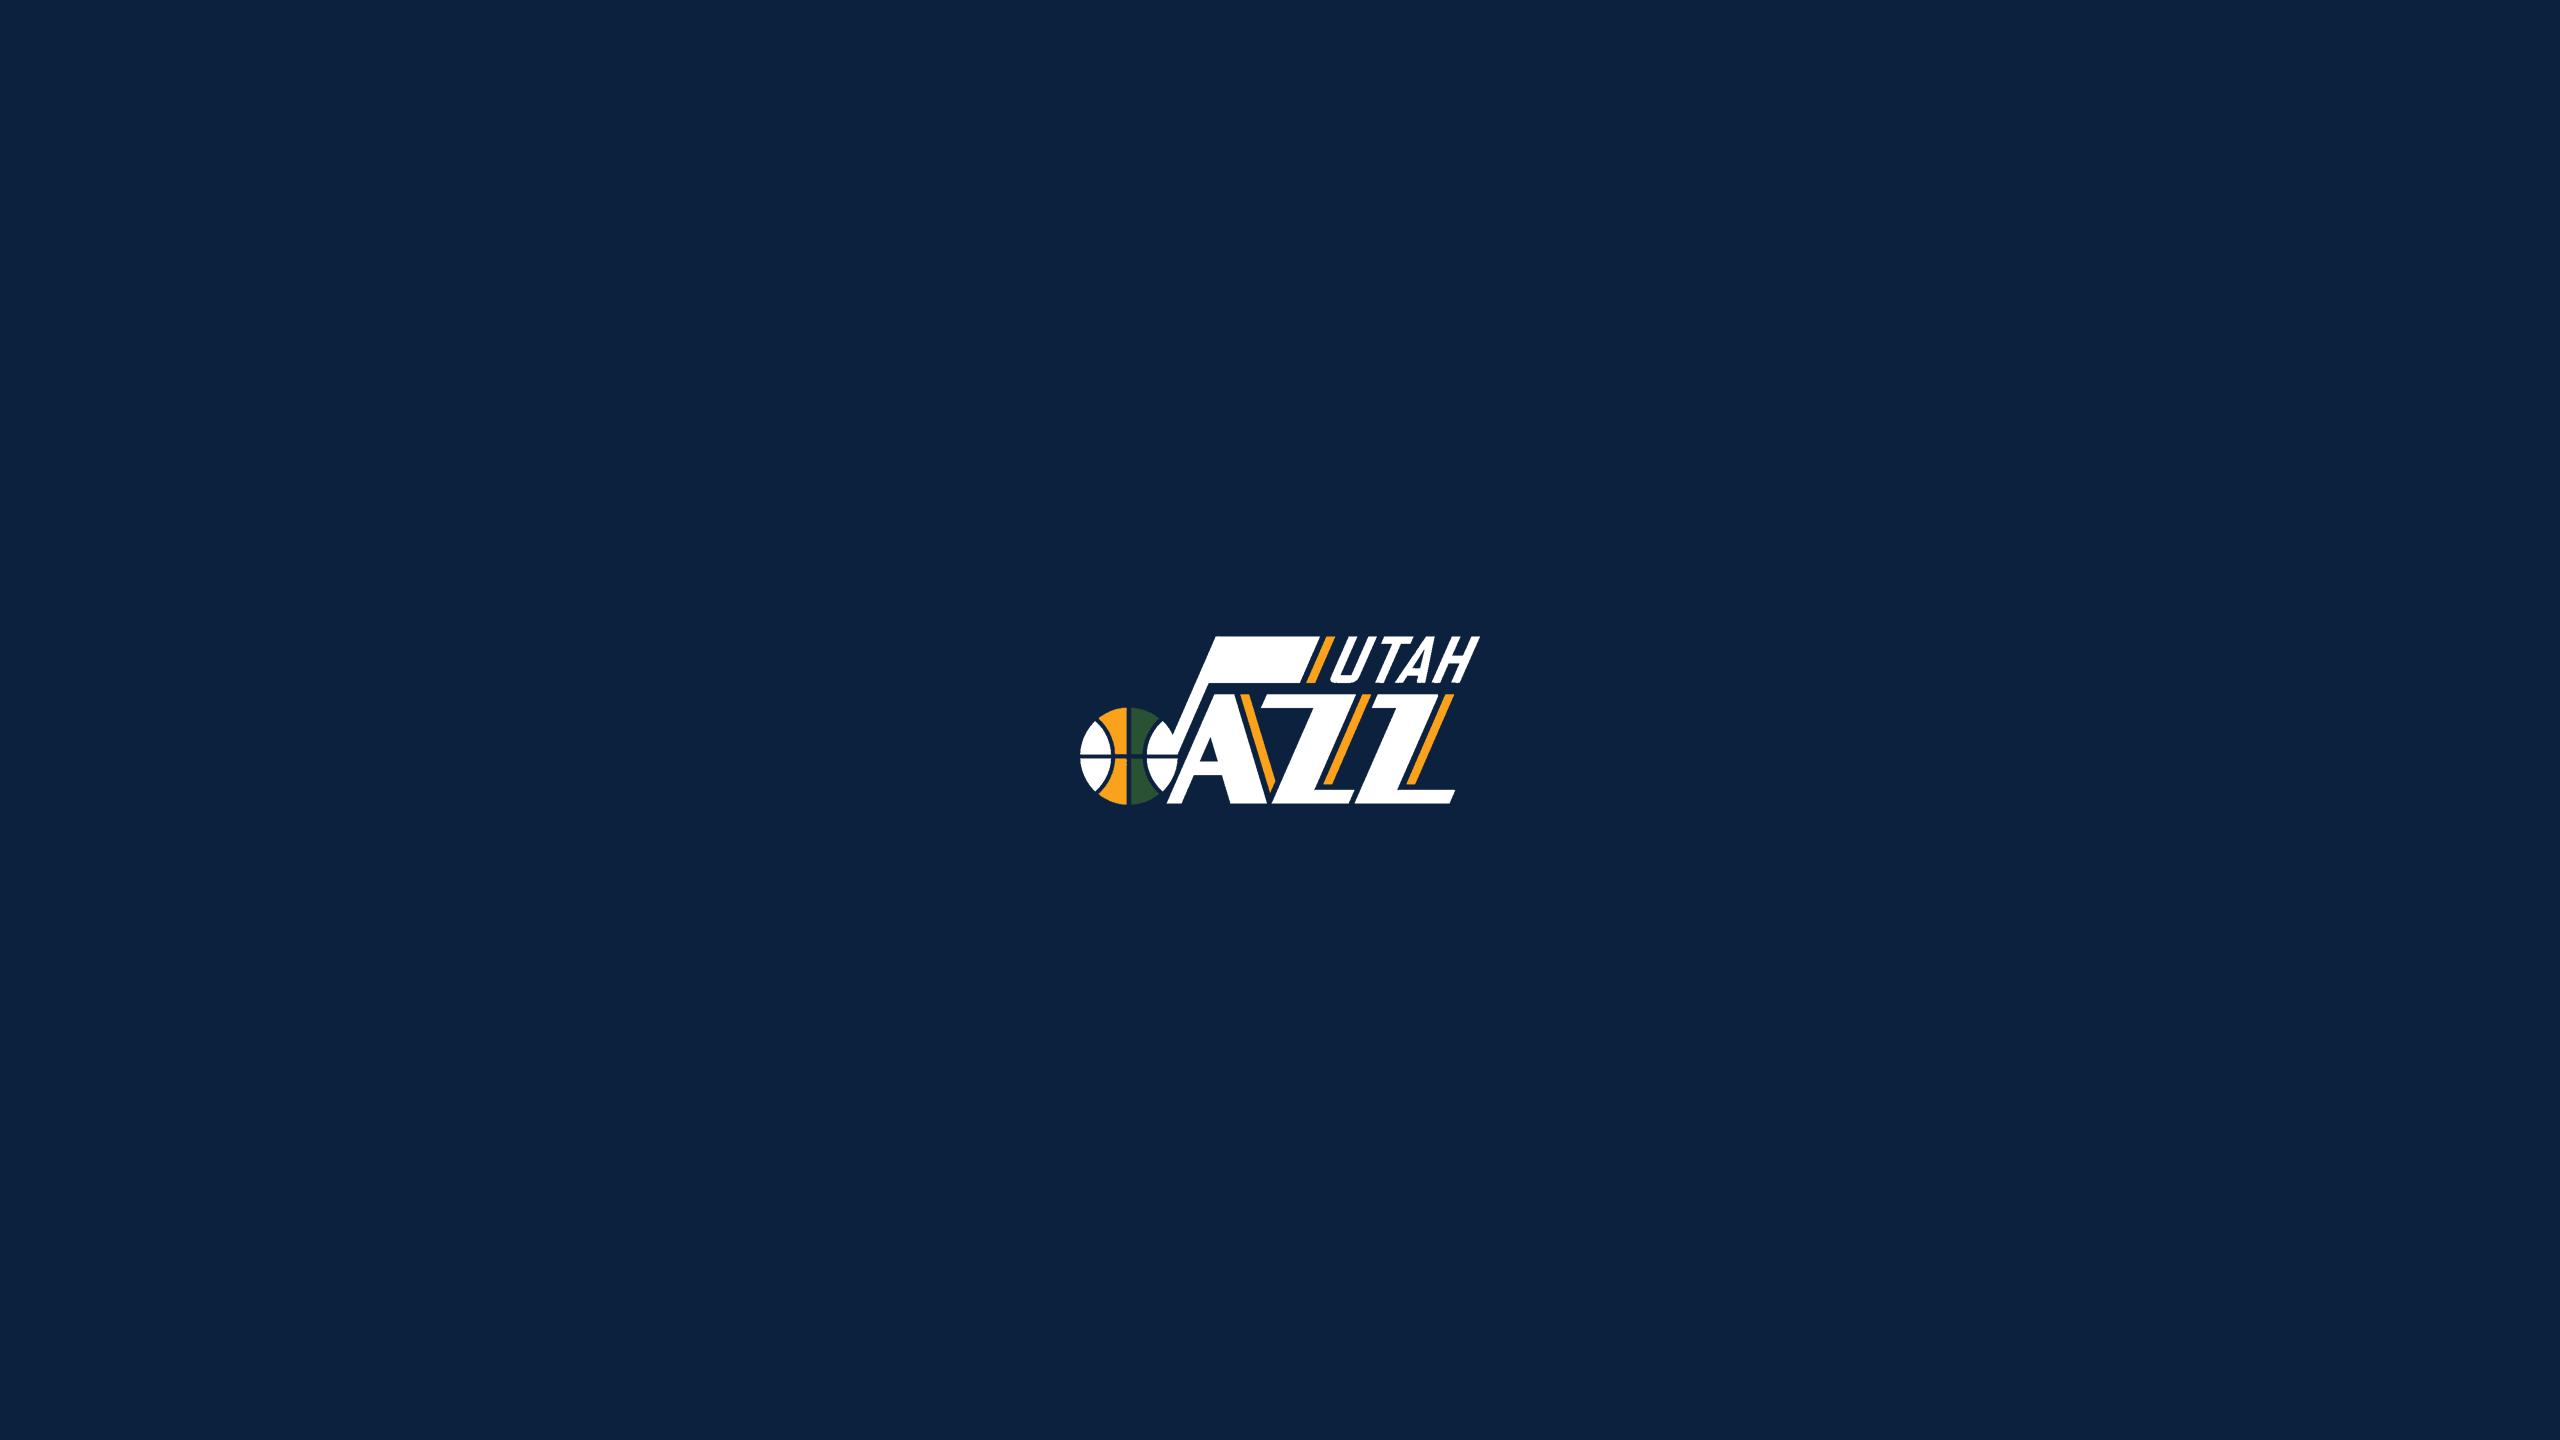 Utah Jazz (Away)